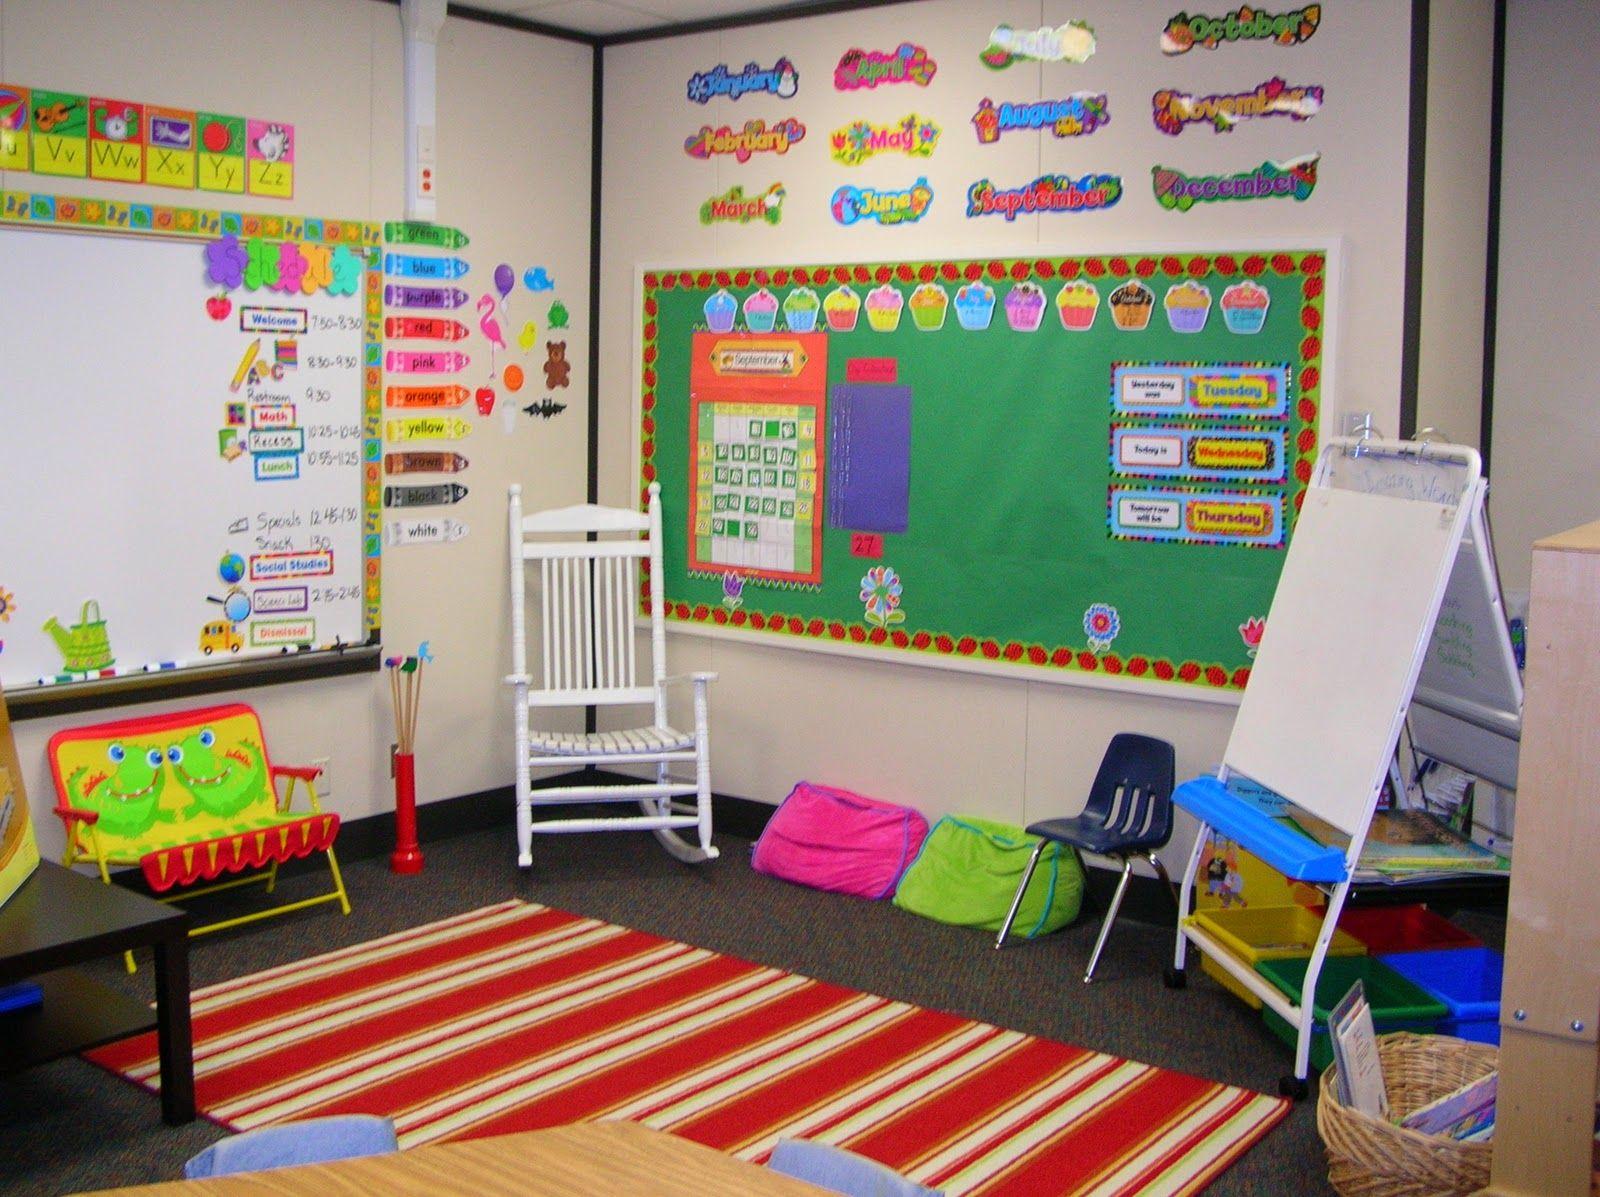 Free Stuff From The Other Kindergarten Teachers